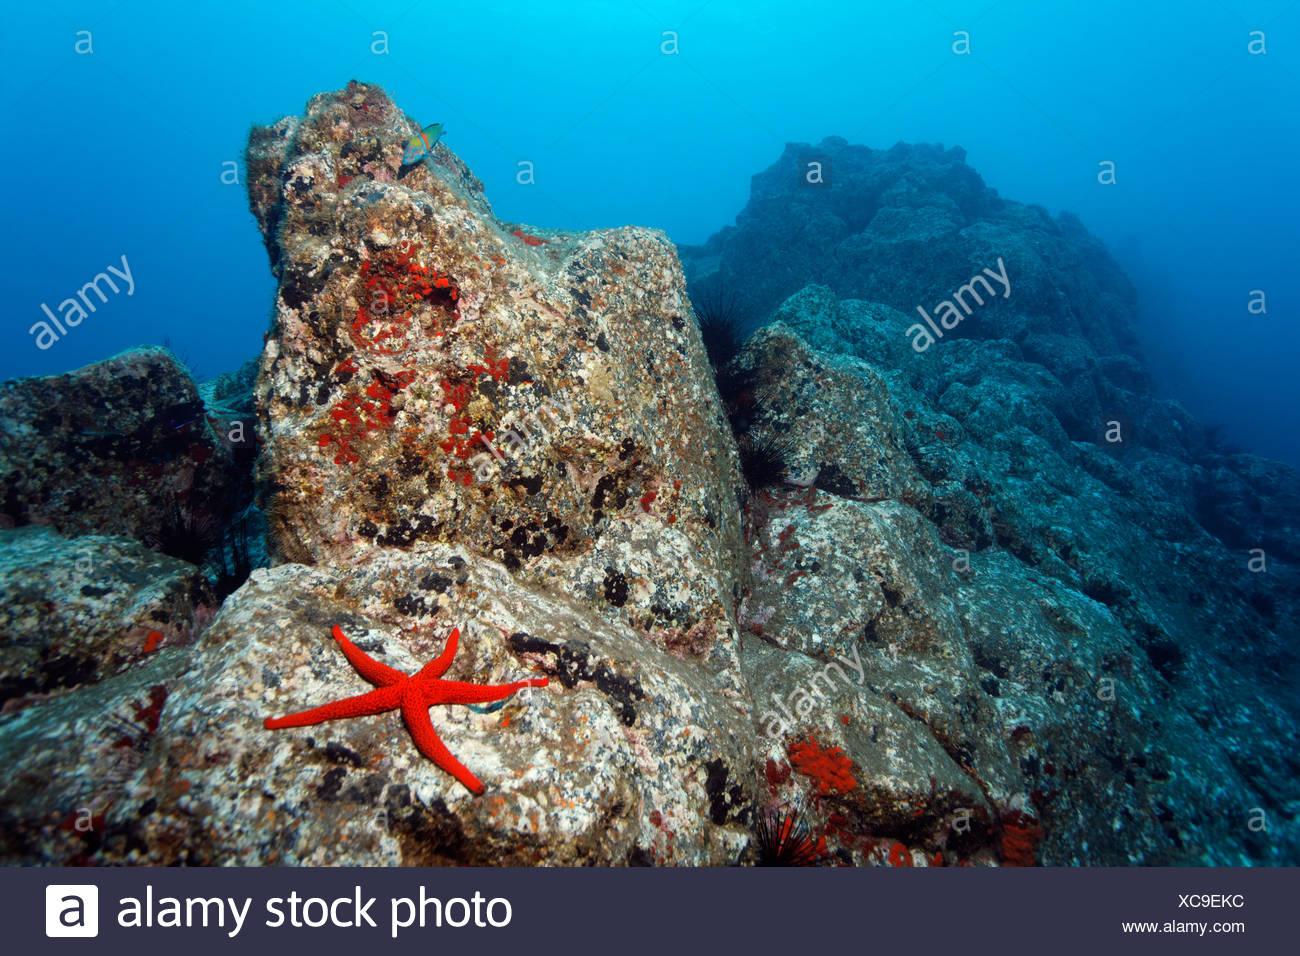 Paysages sous-marins rocheux, rouge, étoile de mer (Echinaster sepositus), Acorn balanes (Balanus trigonus), Madeira, Portugal, Europe Photo Stock